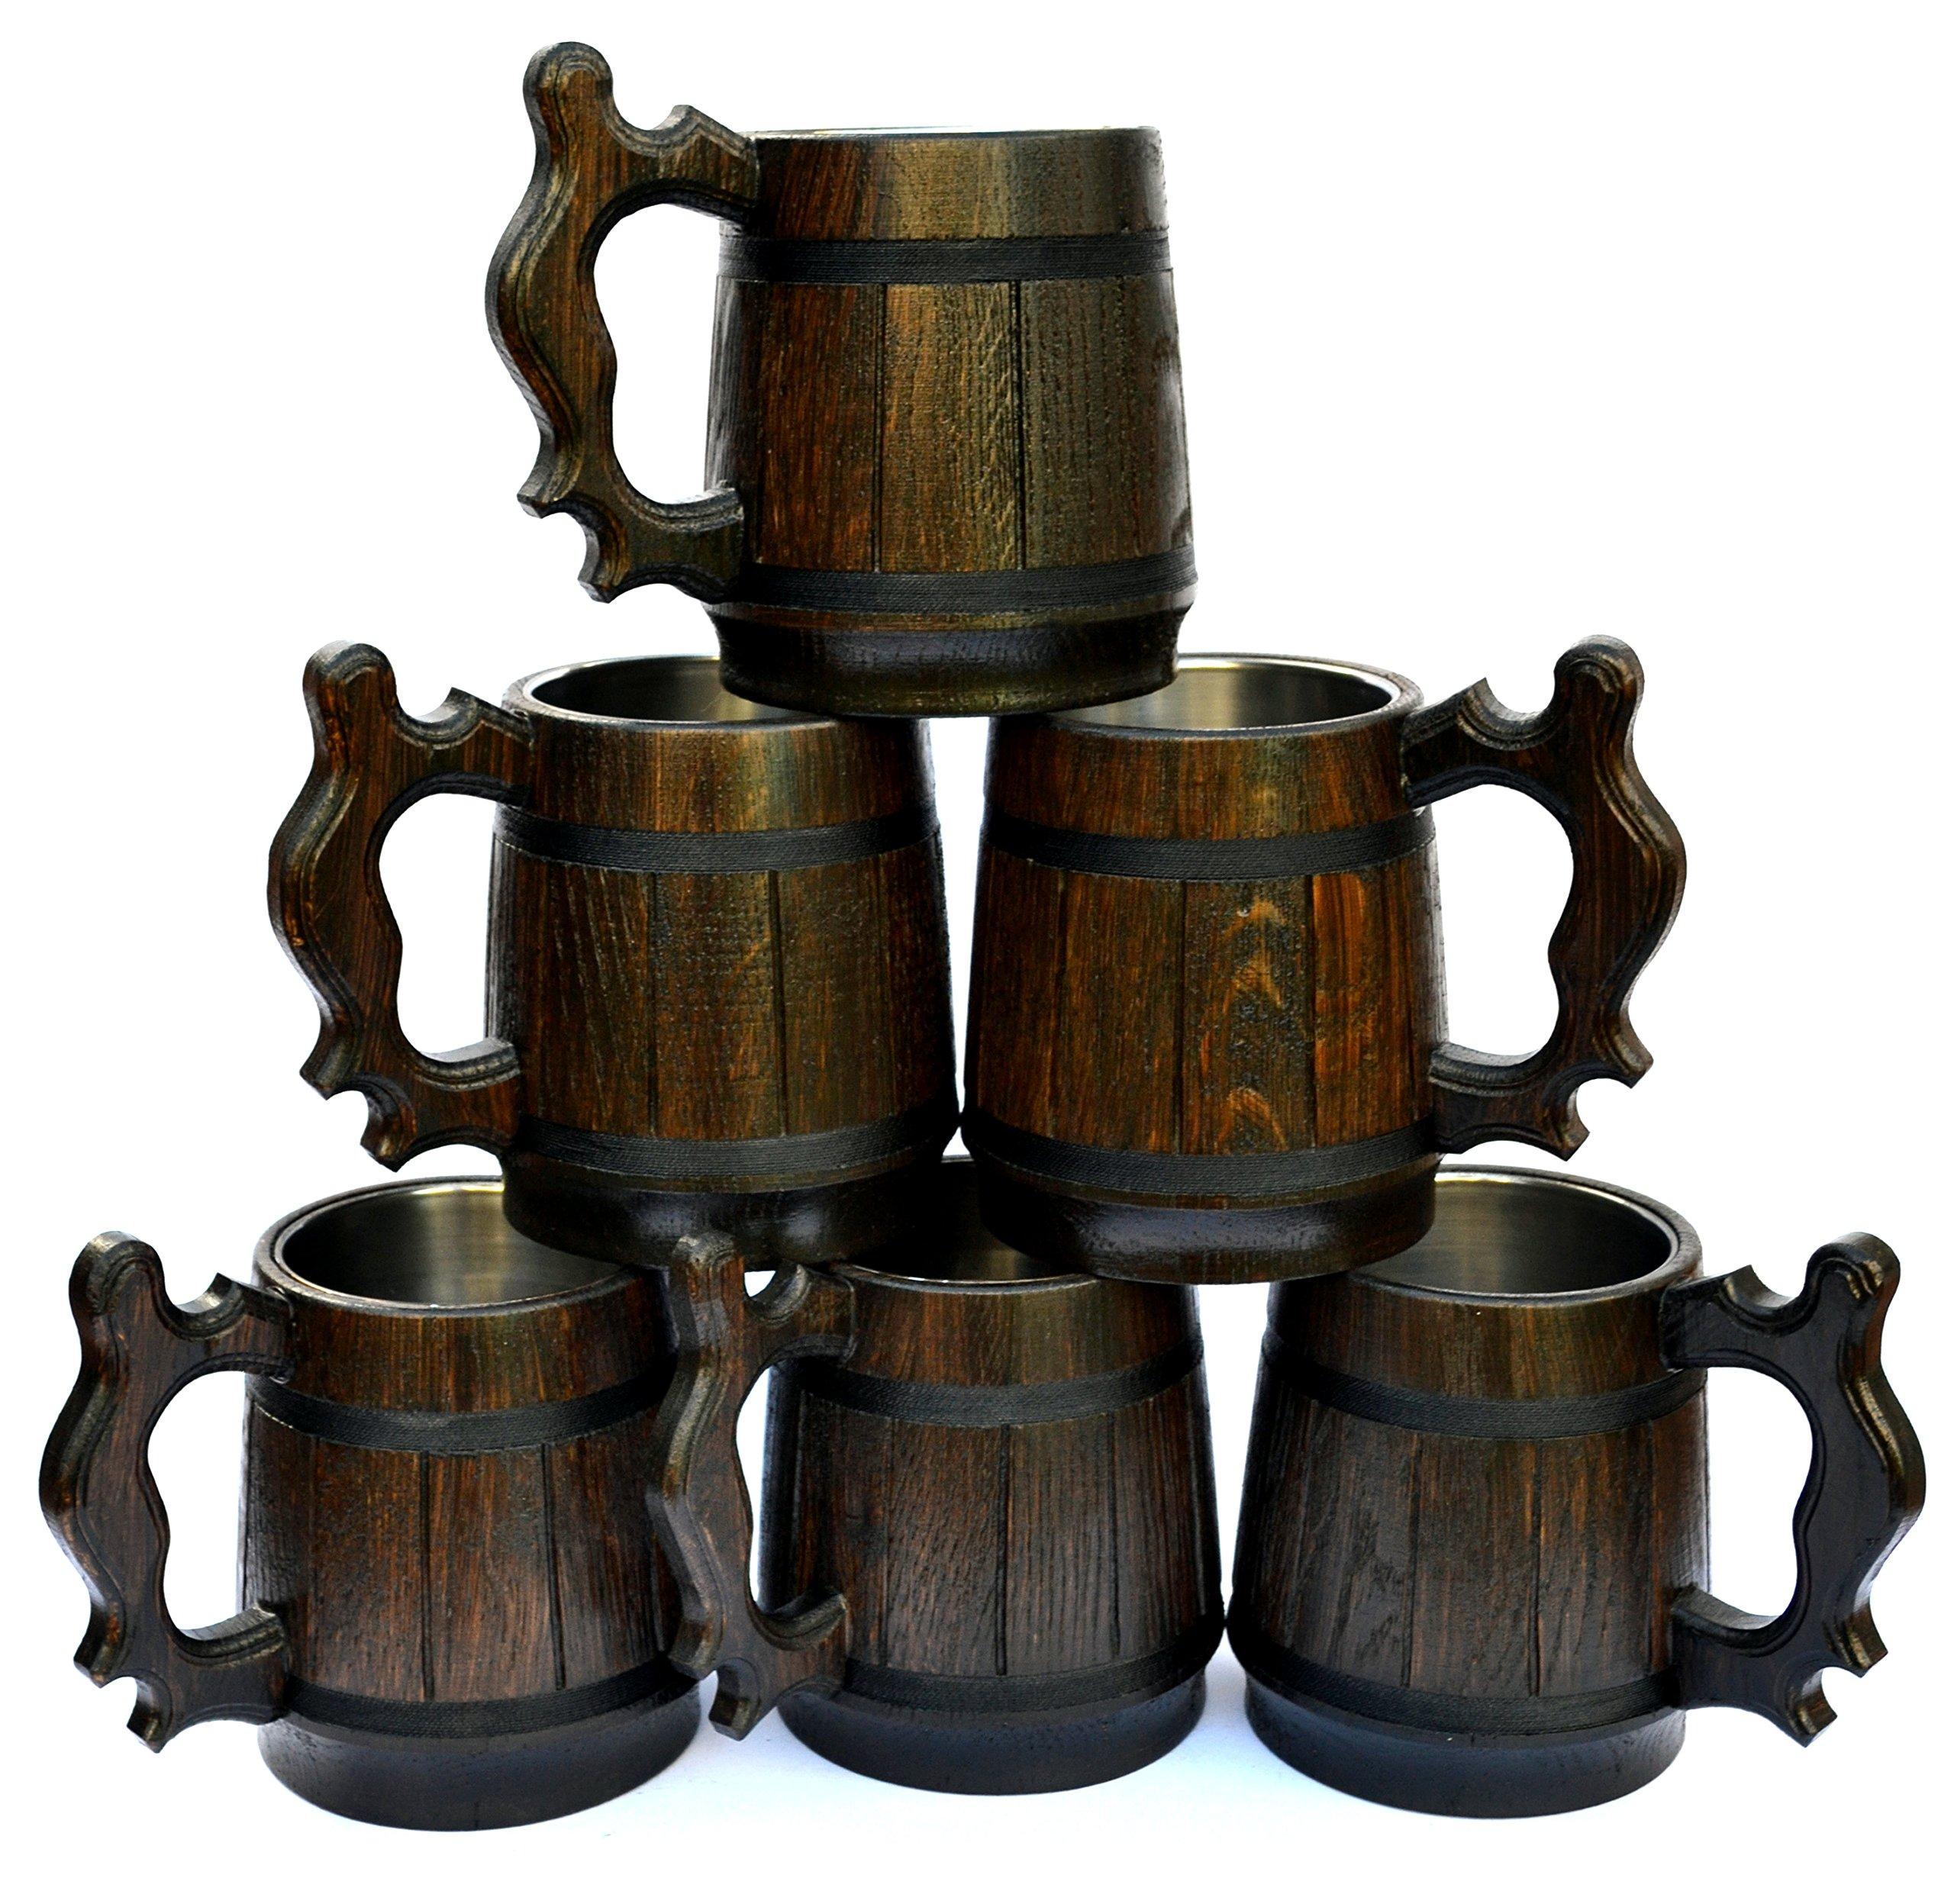 Handmade Beer Mug Set of 6 Oak Wood Stainless Steel Cup Gift Natural Eco-Friendly 0.6L 20oz Retro Brown